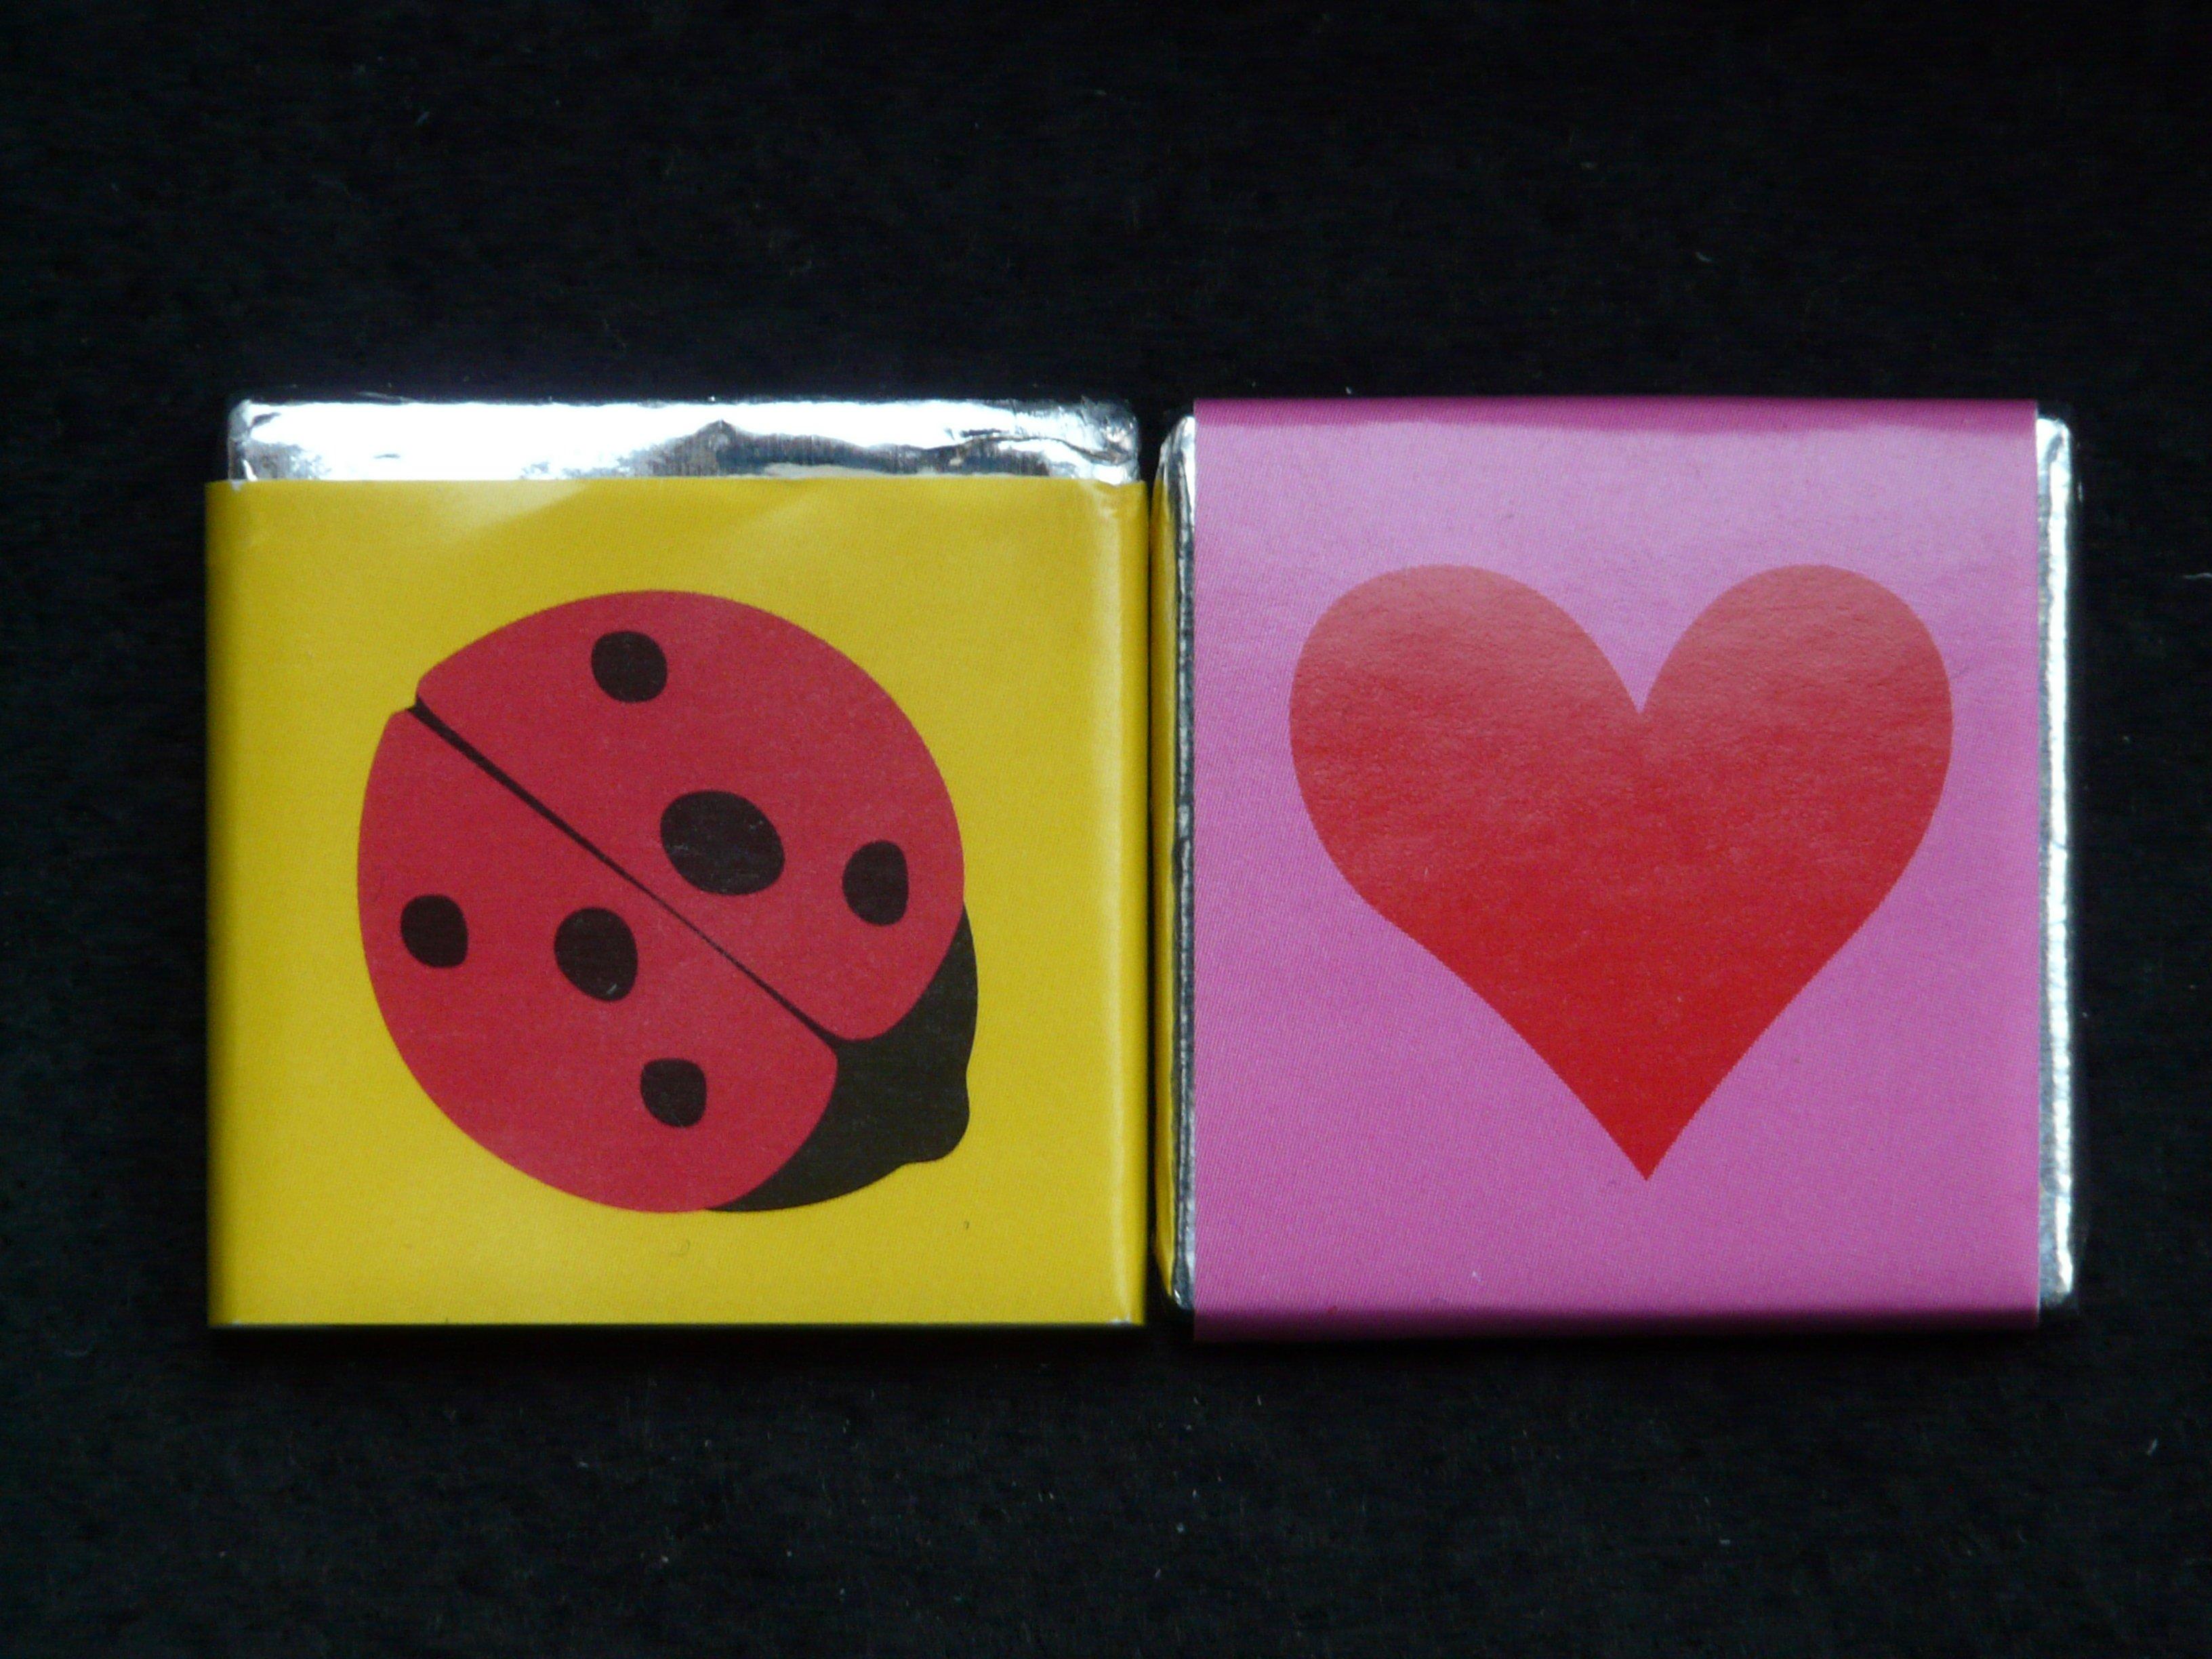 Fotos Gratis Numero Amor Corazon Mariquita Rosado Chocolate